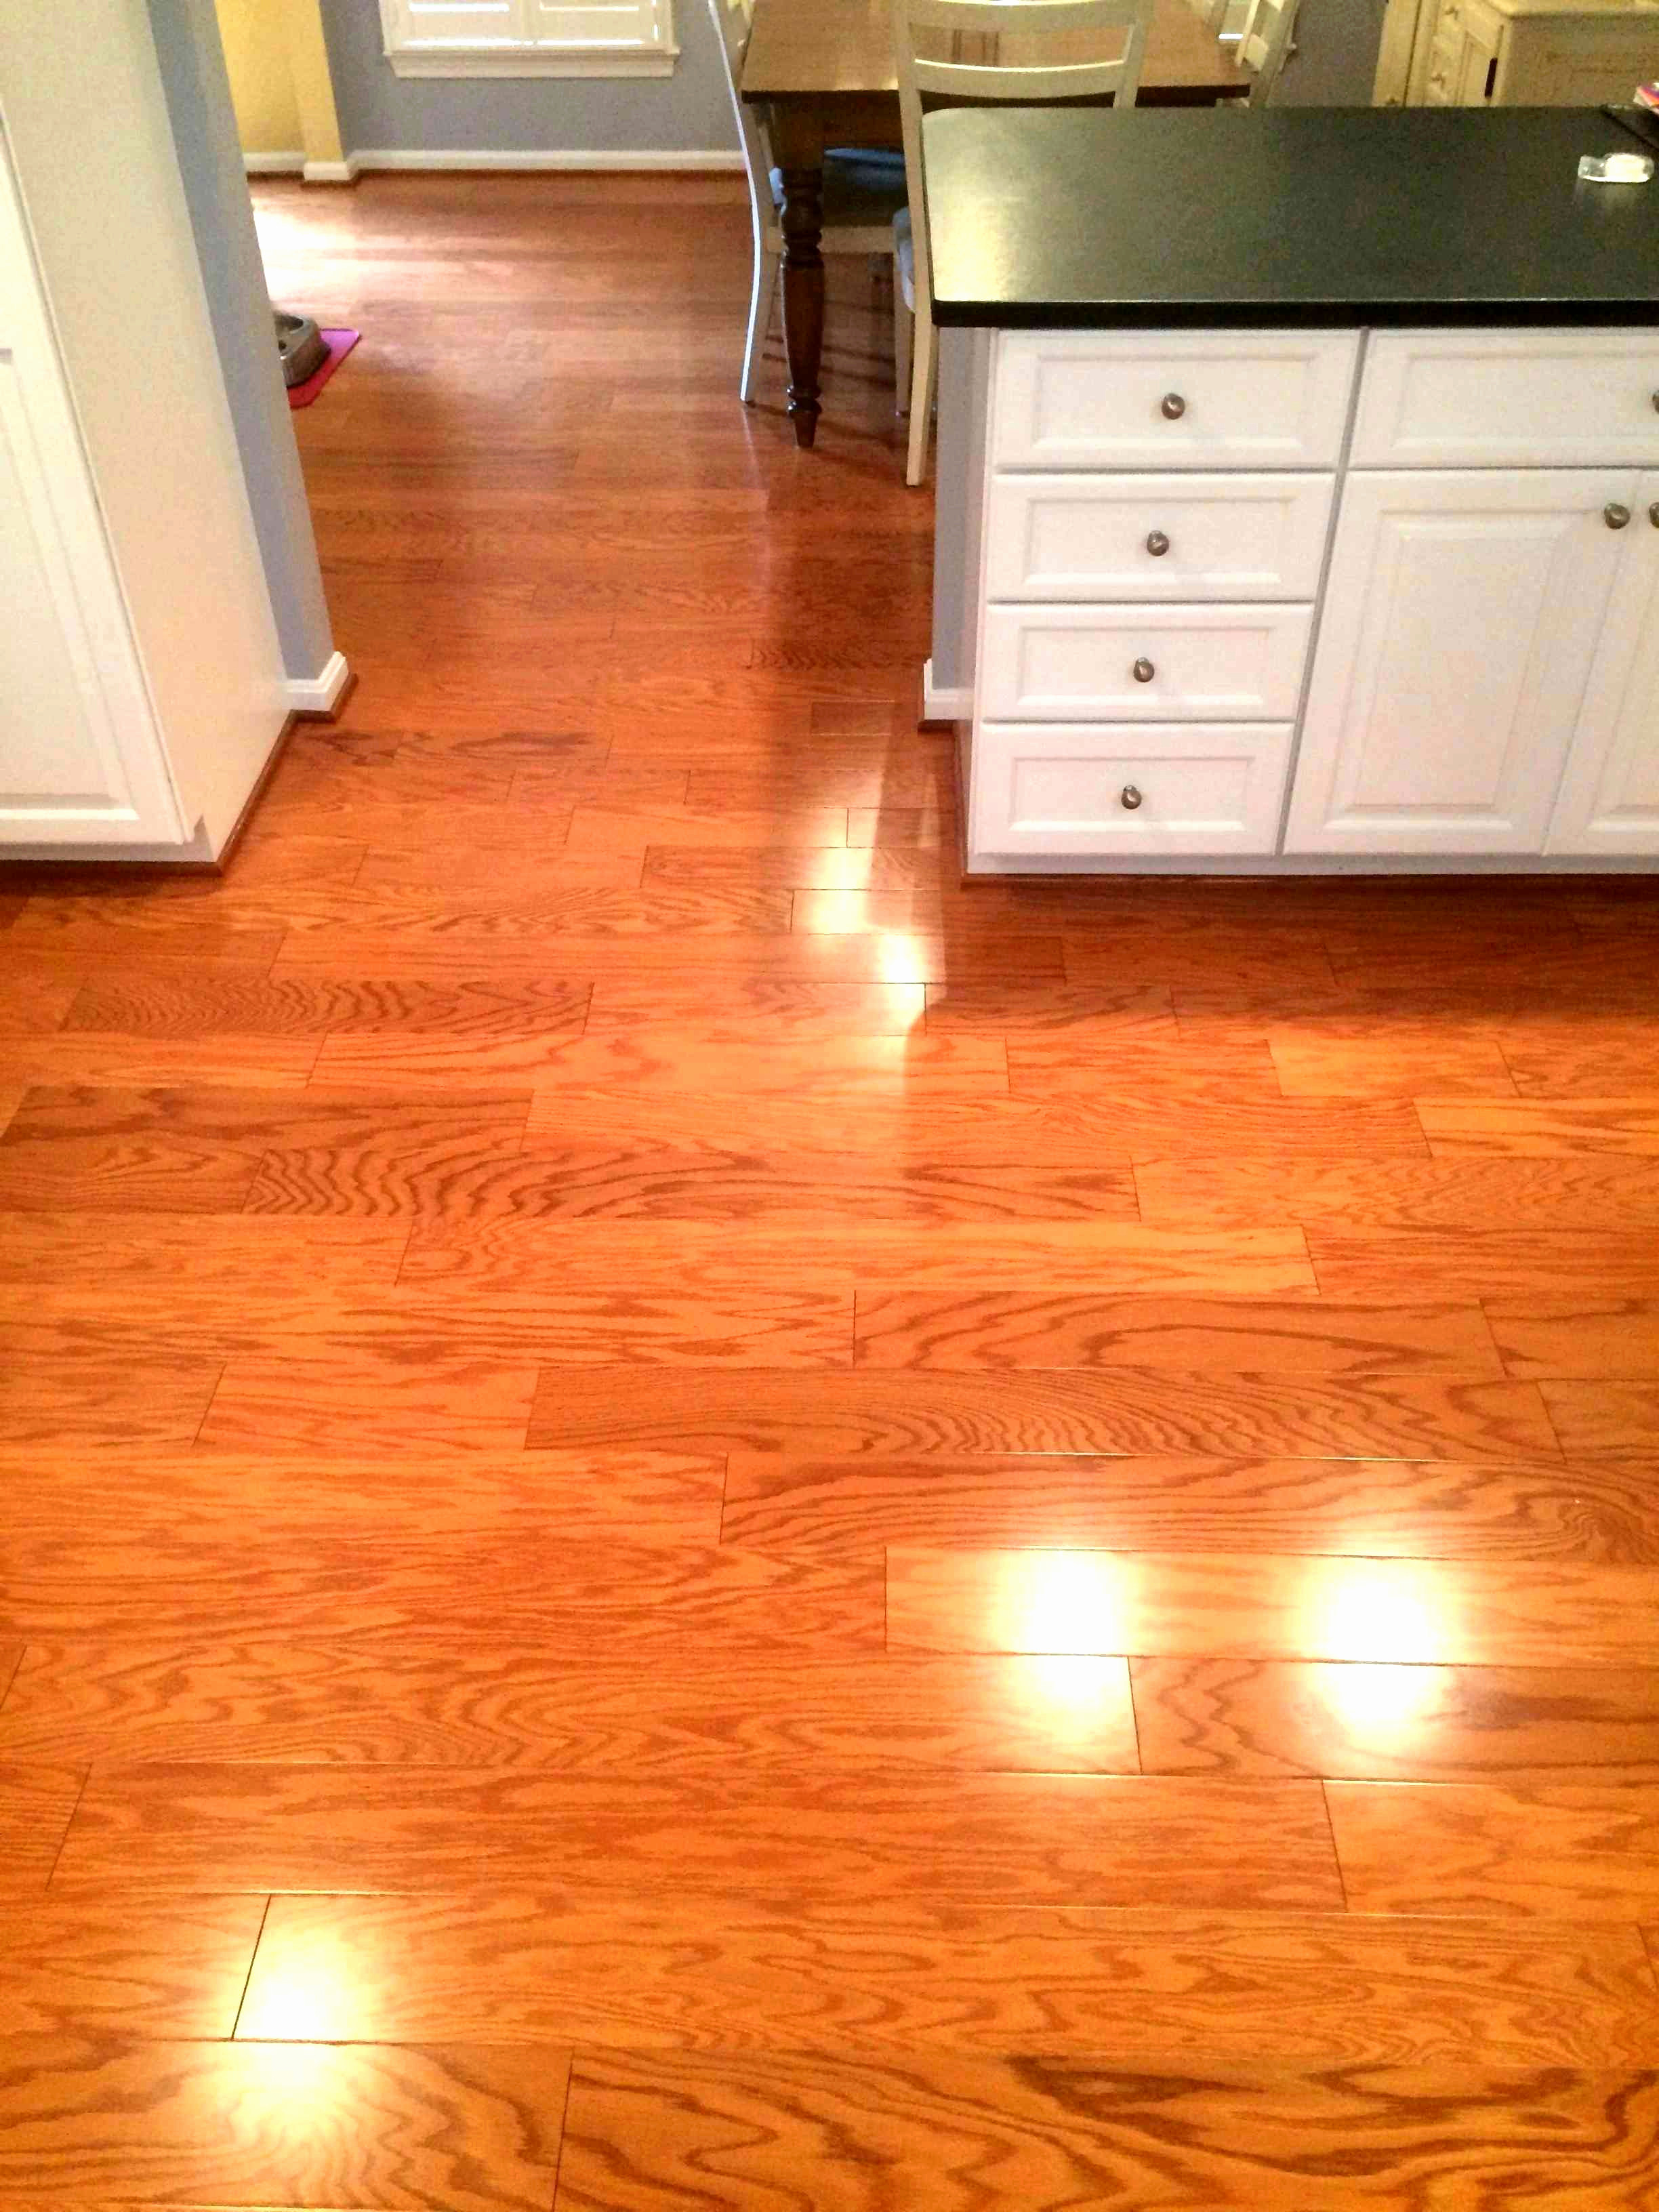 2 1 4 engineered hardwood flooring of underlayment for hardwood floors 20 awesome engineered wood flooring in underlayment for hardwood floors 20 awesome engineered wood flooring cost